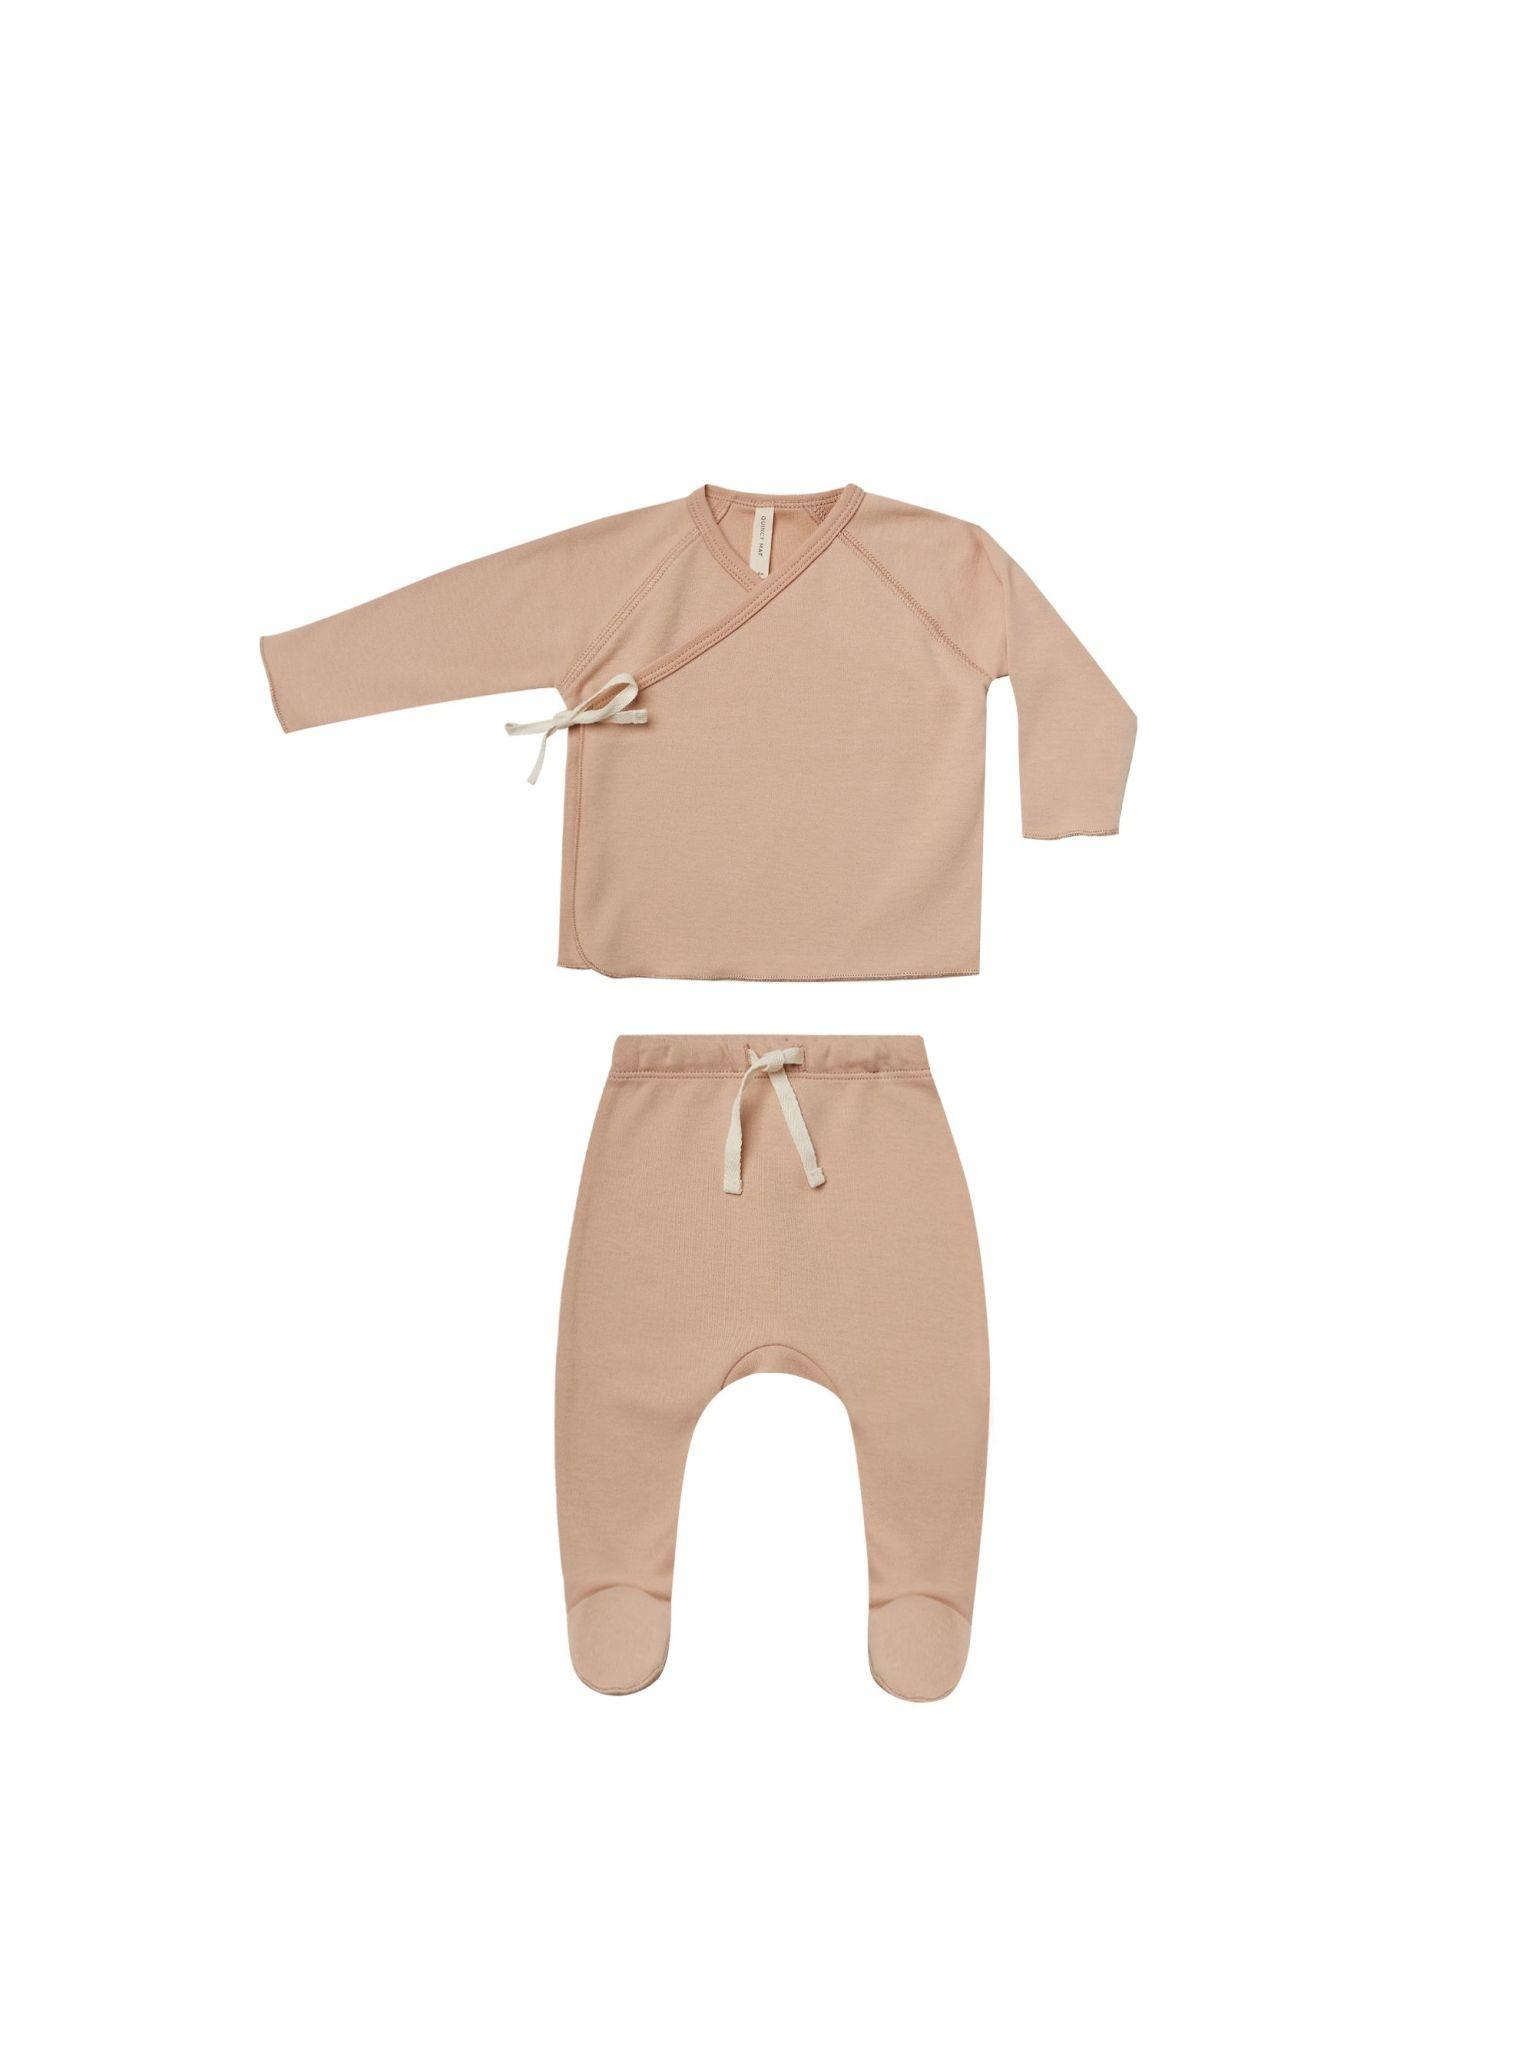 Quincy Mae Quincy Mae Wrap Top & Pant Set